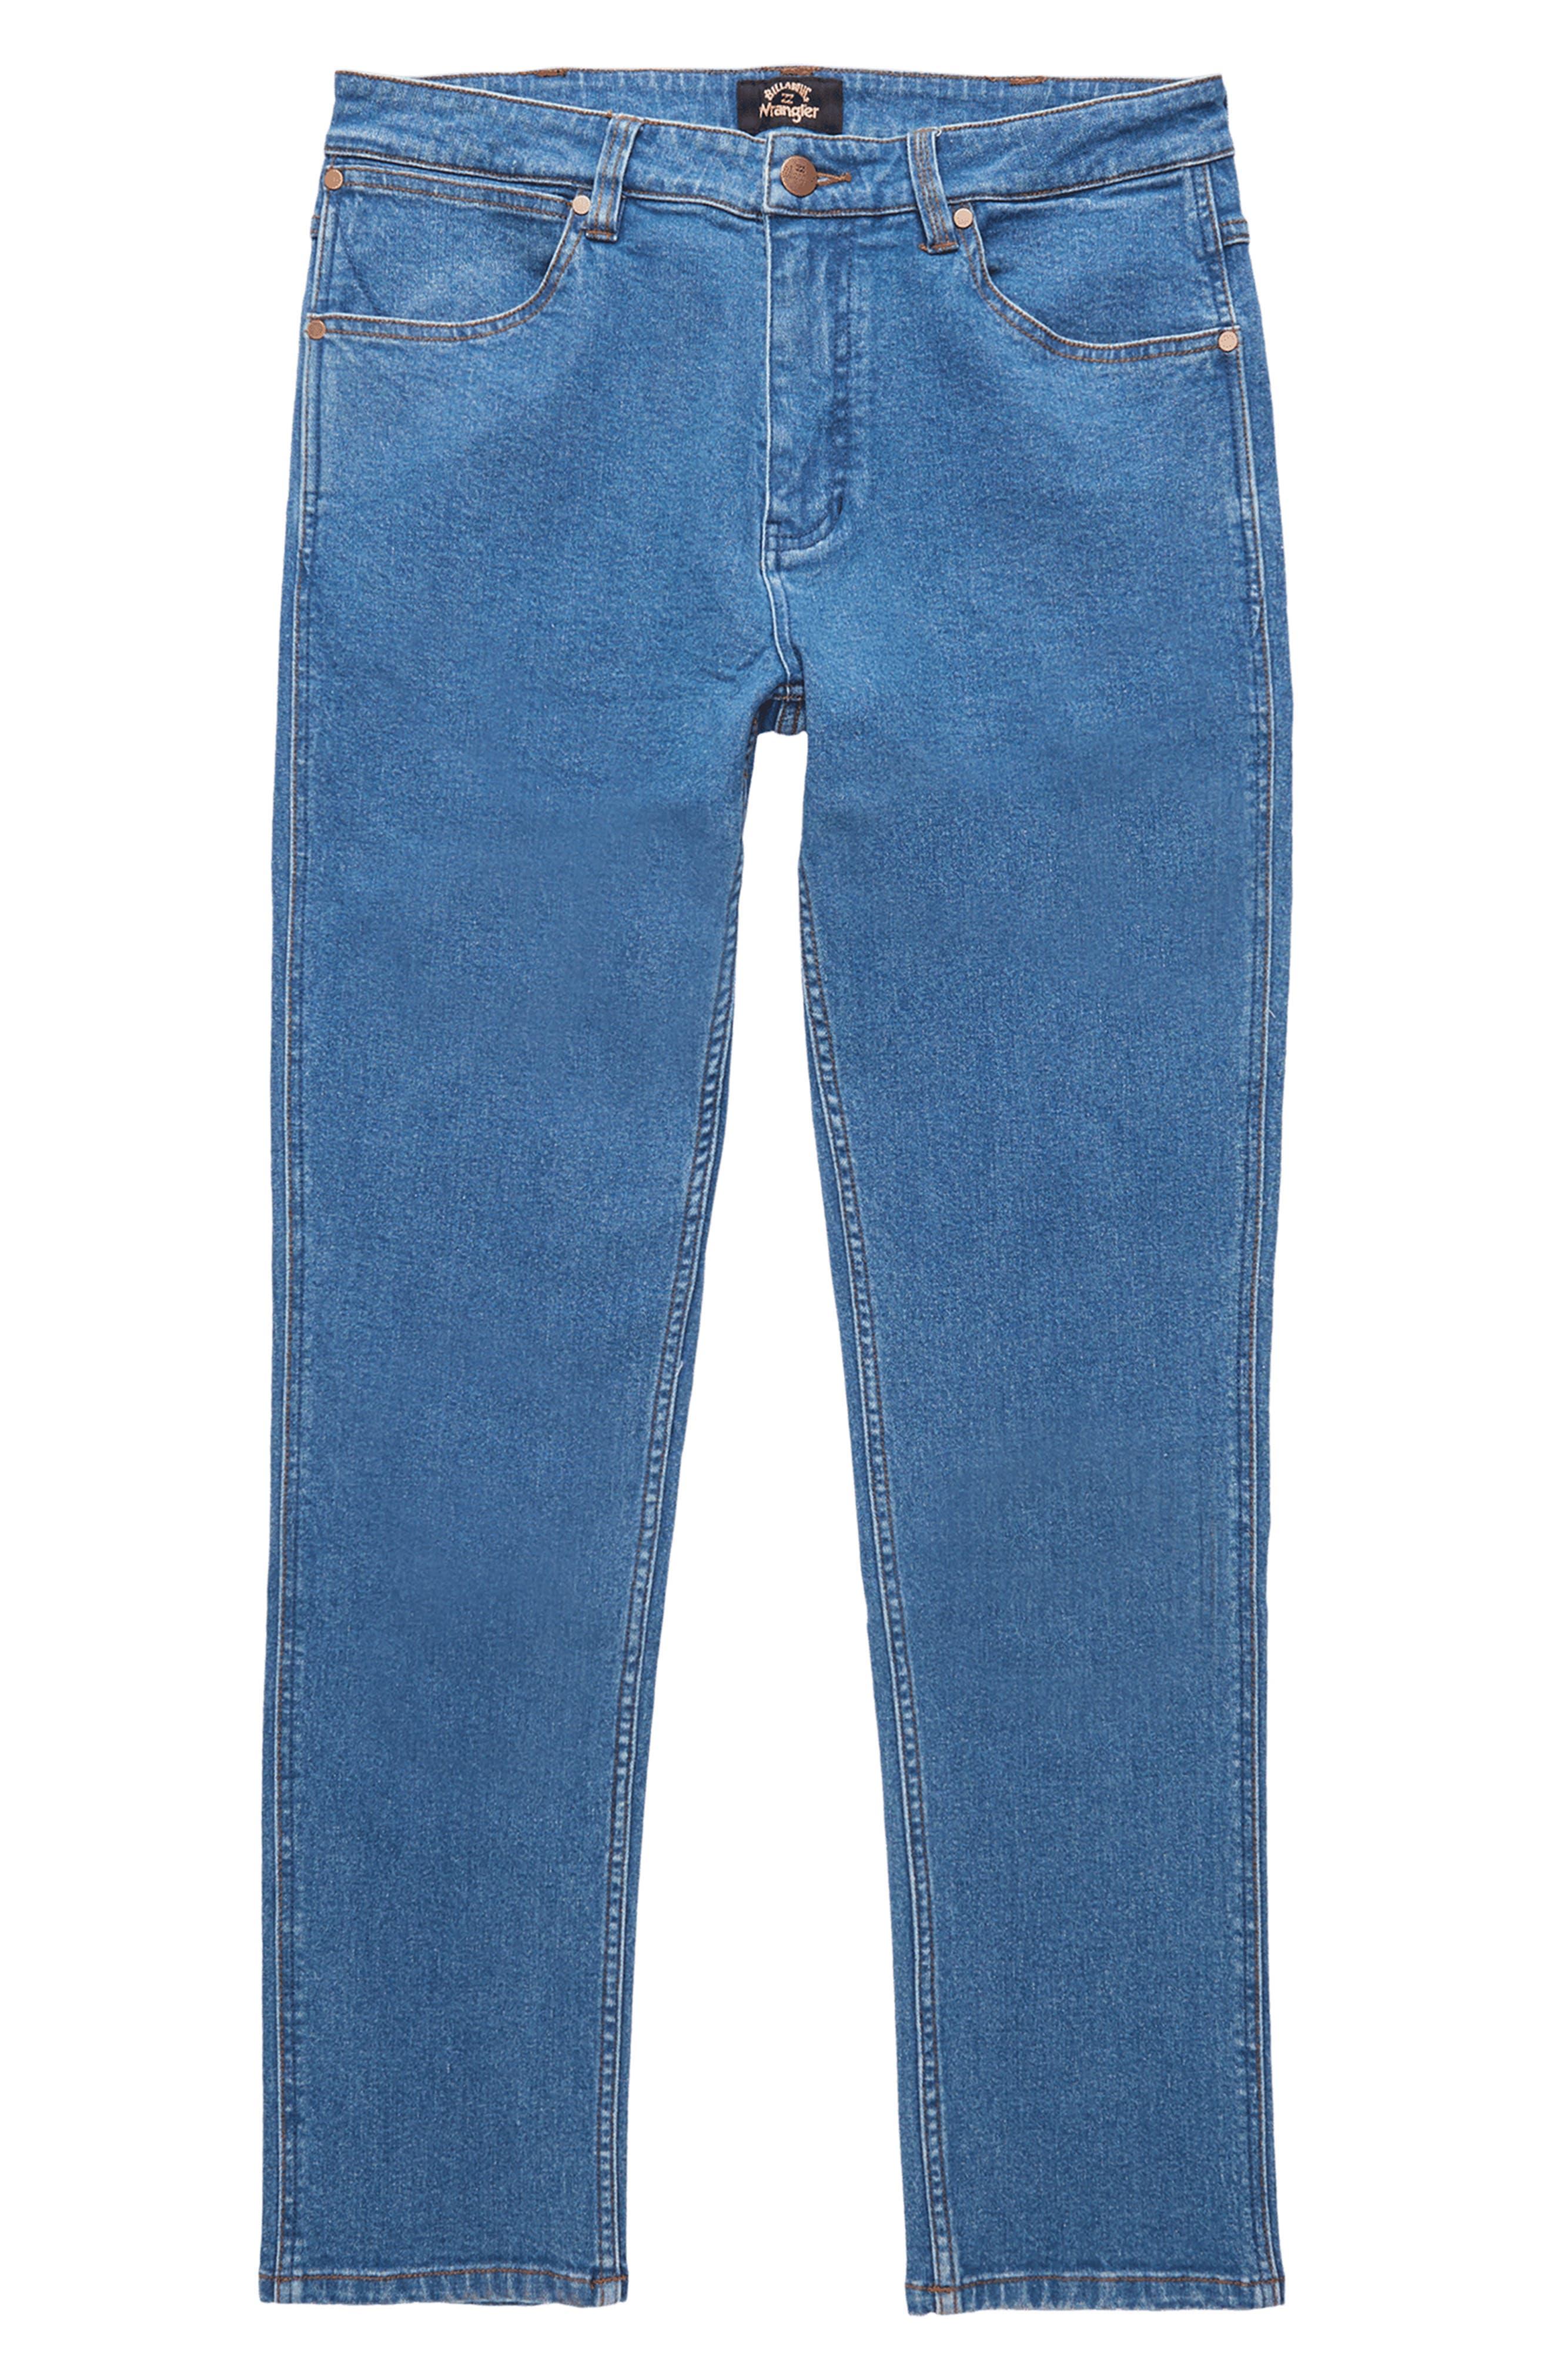 X Wrangler Organic Cotton & Hemp Straight Leg Jeans